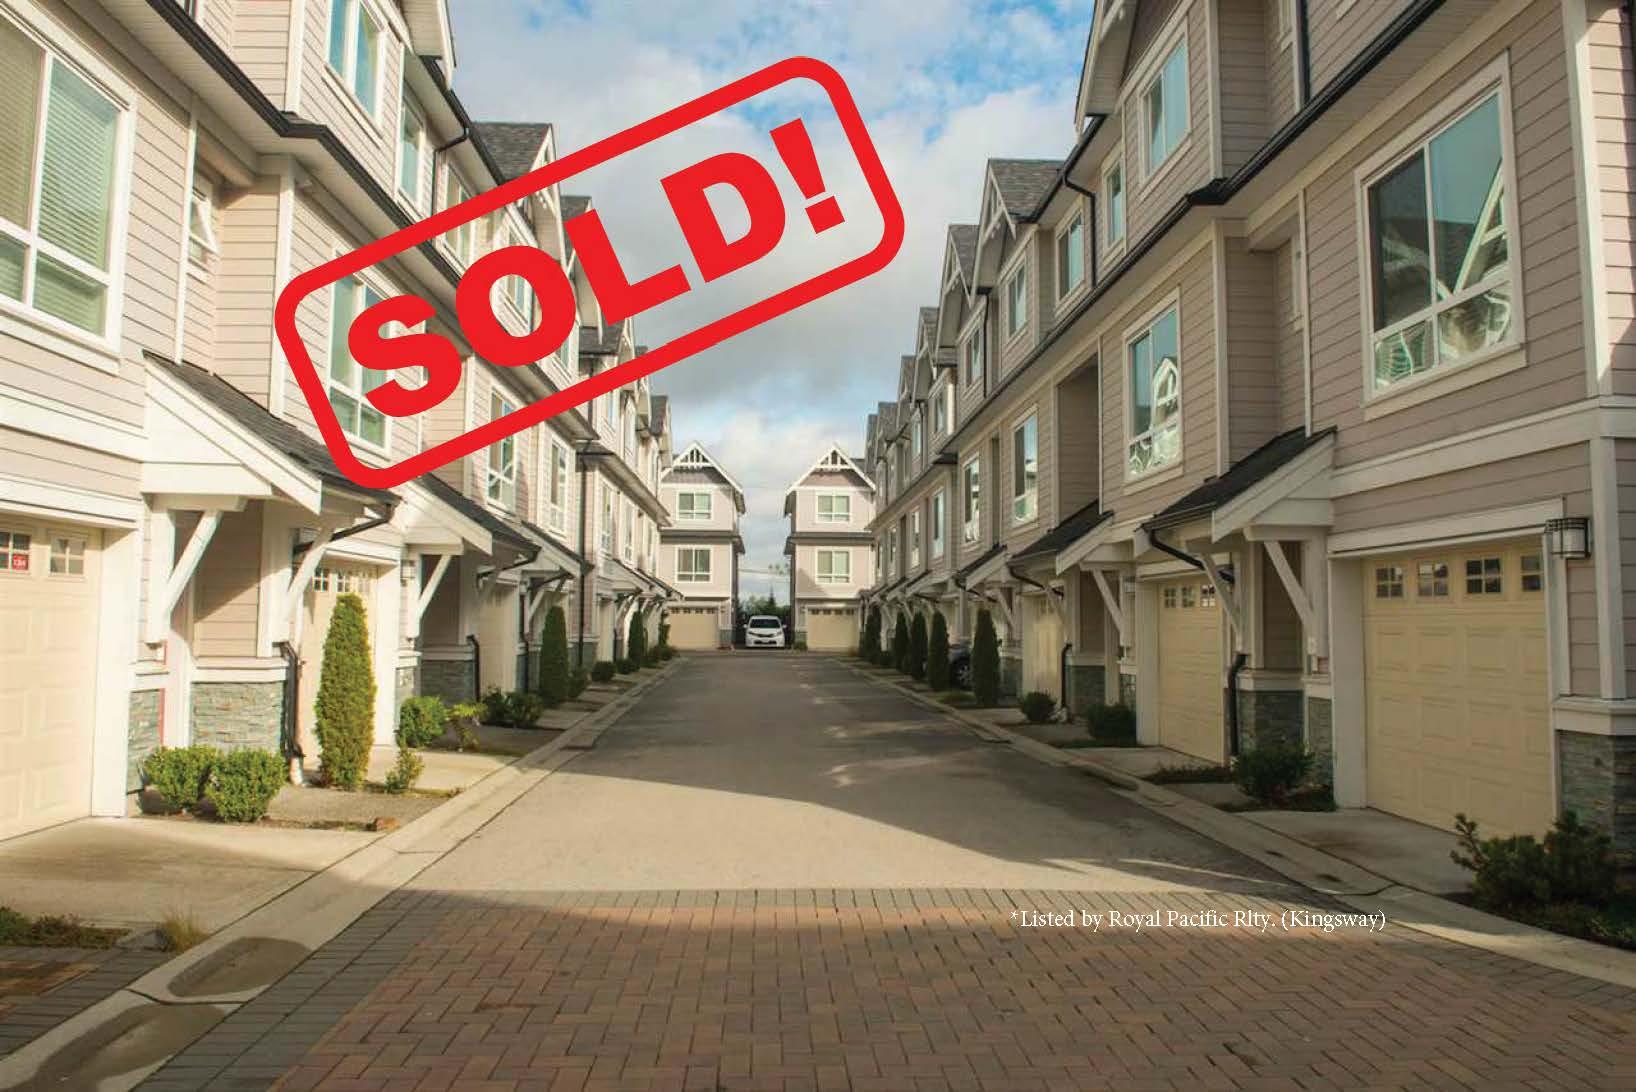 24-6199 Birch Street   SOLD FOR: $880,000  3 BED | 3 BATH | 1,372 SF